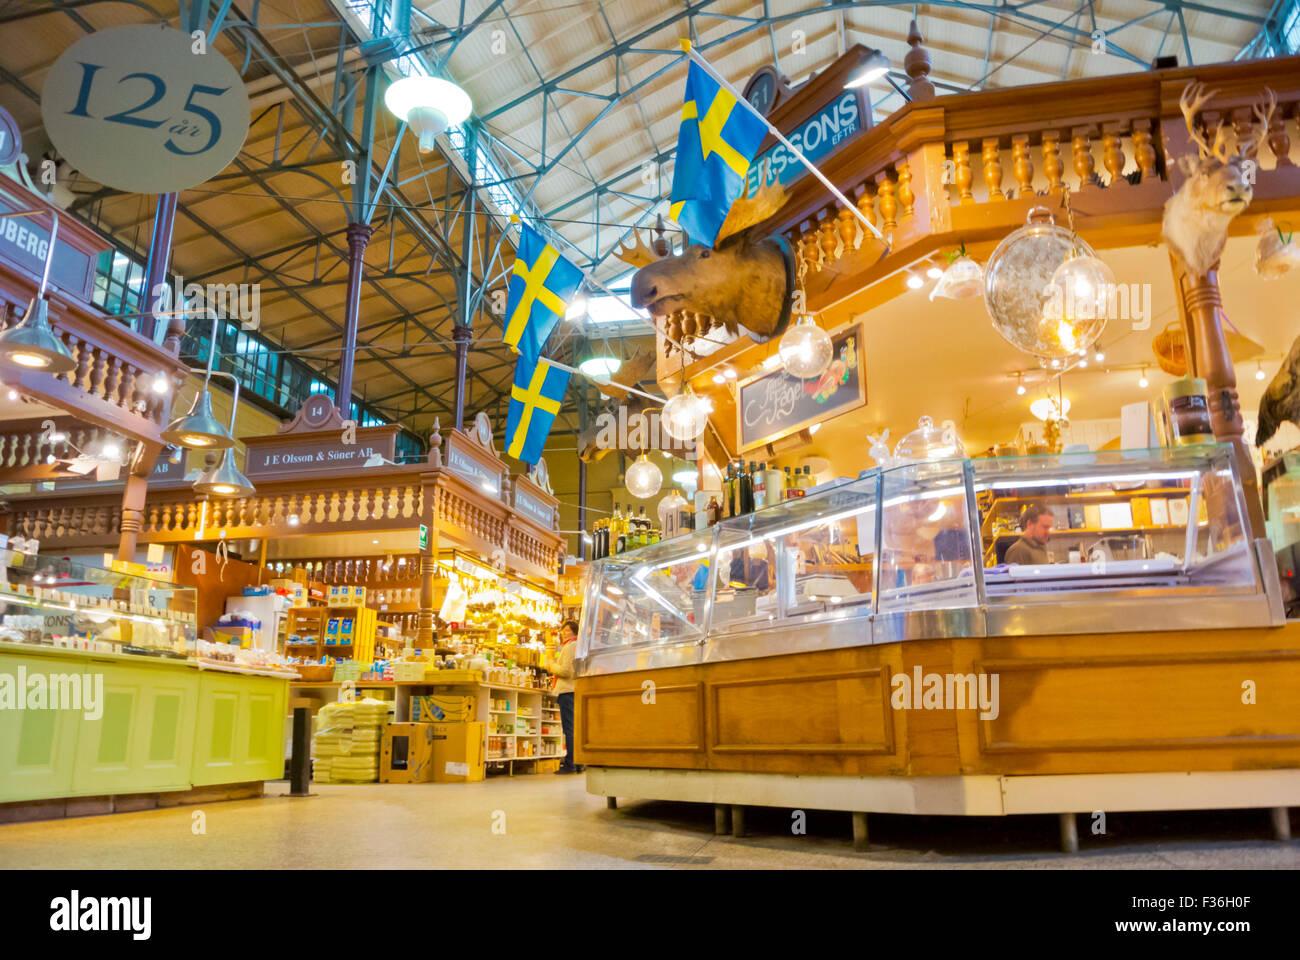 Östermalms Saluhall, Markthalle, Stadtteil Östermalm, Stockholm, Schweden Stockbild